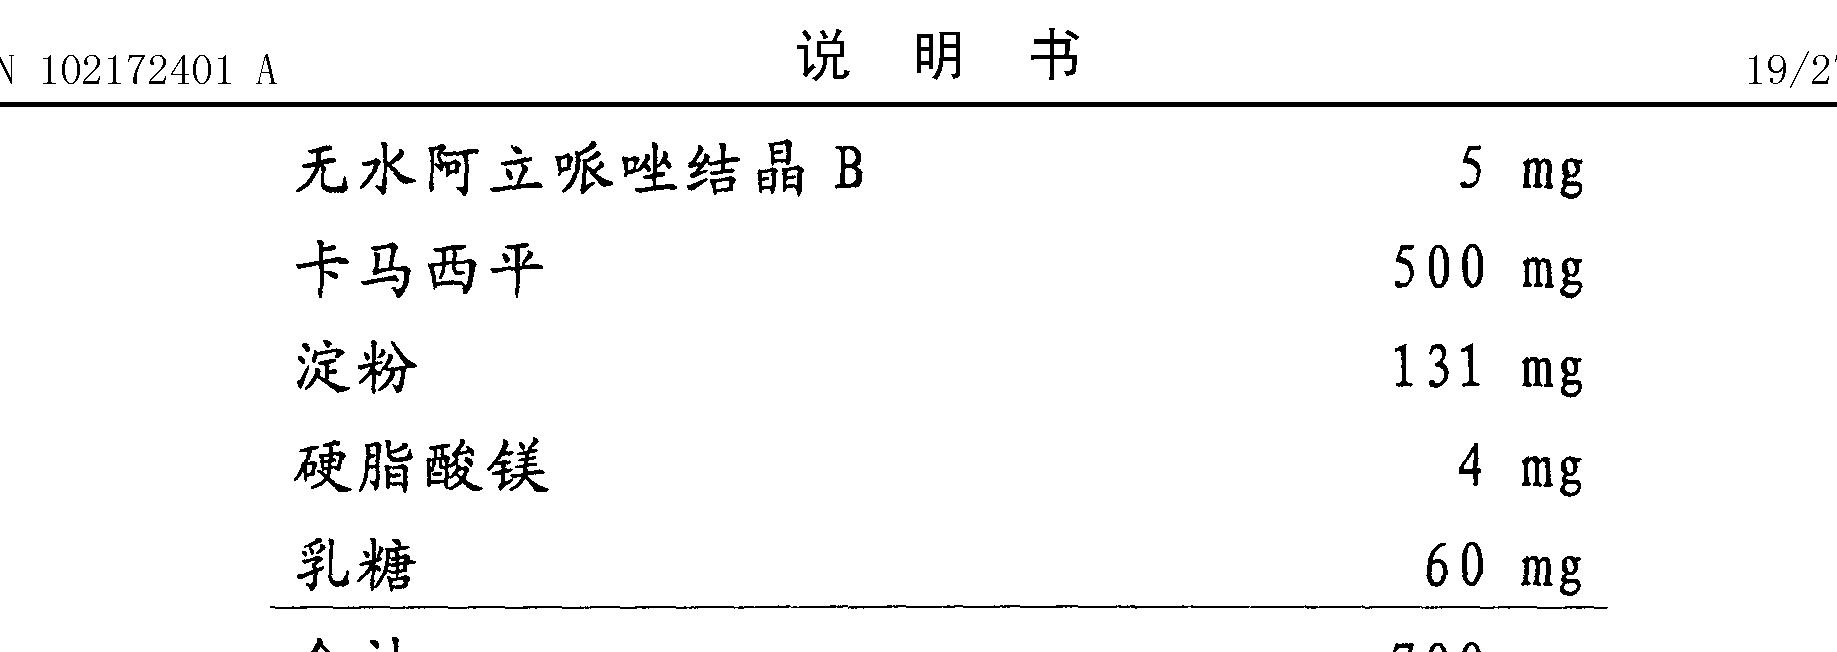 Figure CN102172401AD00211